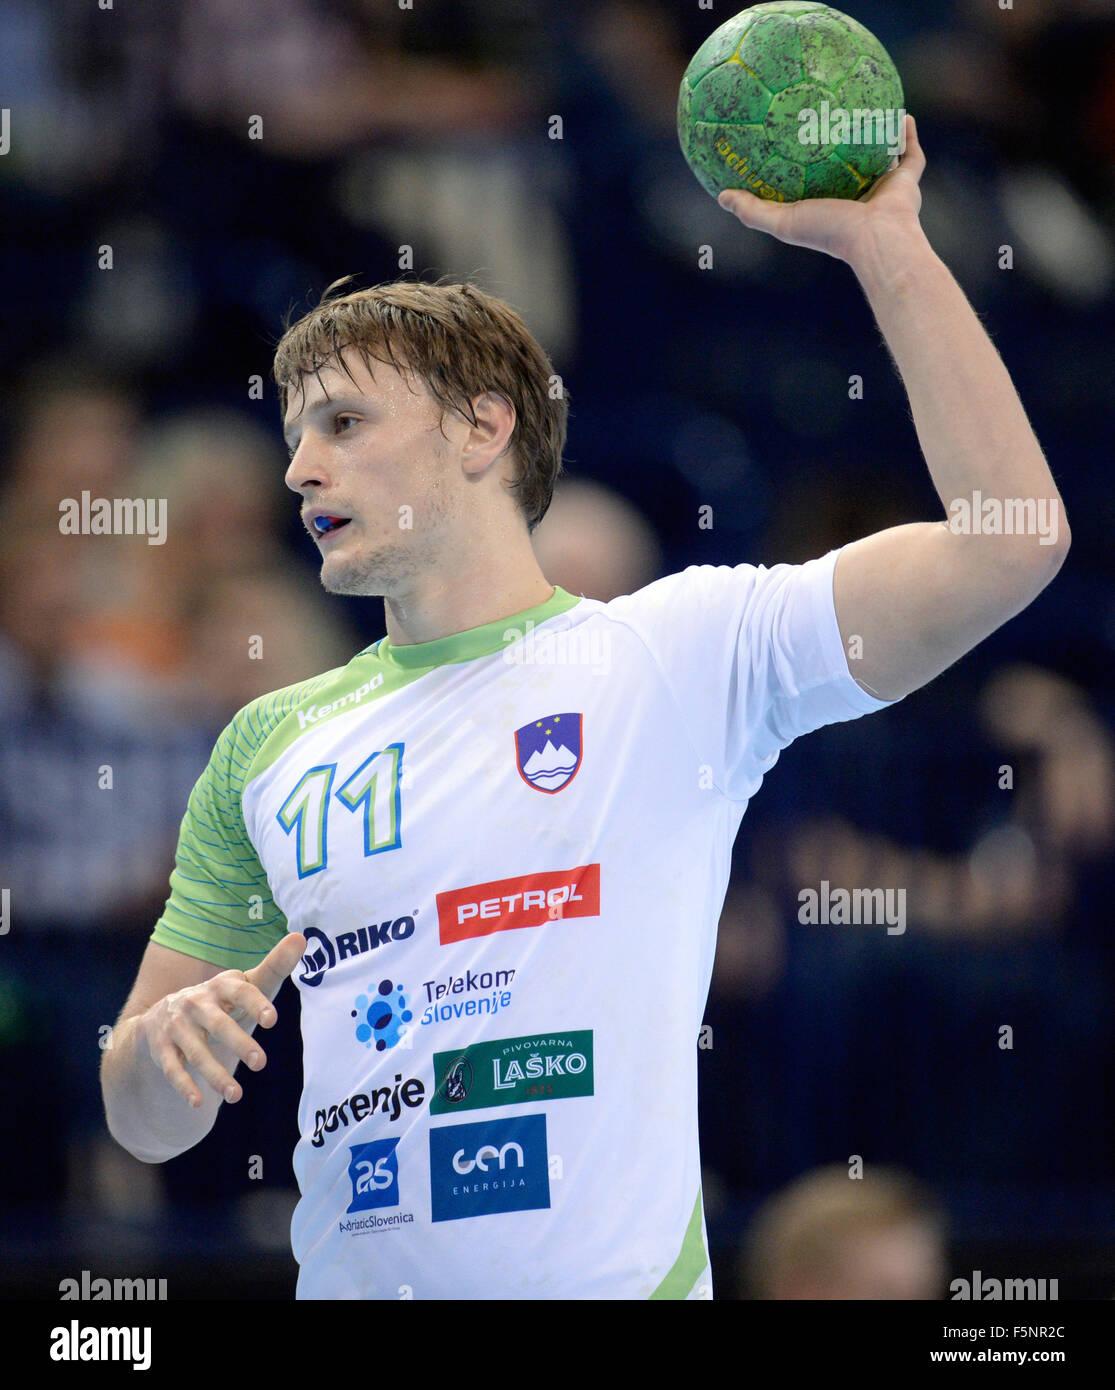 Hamburg, Germany. 07th Nov, 2015. Slovenia's Jure Dolenec in action during the Supercup men's handball match - Stock Image